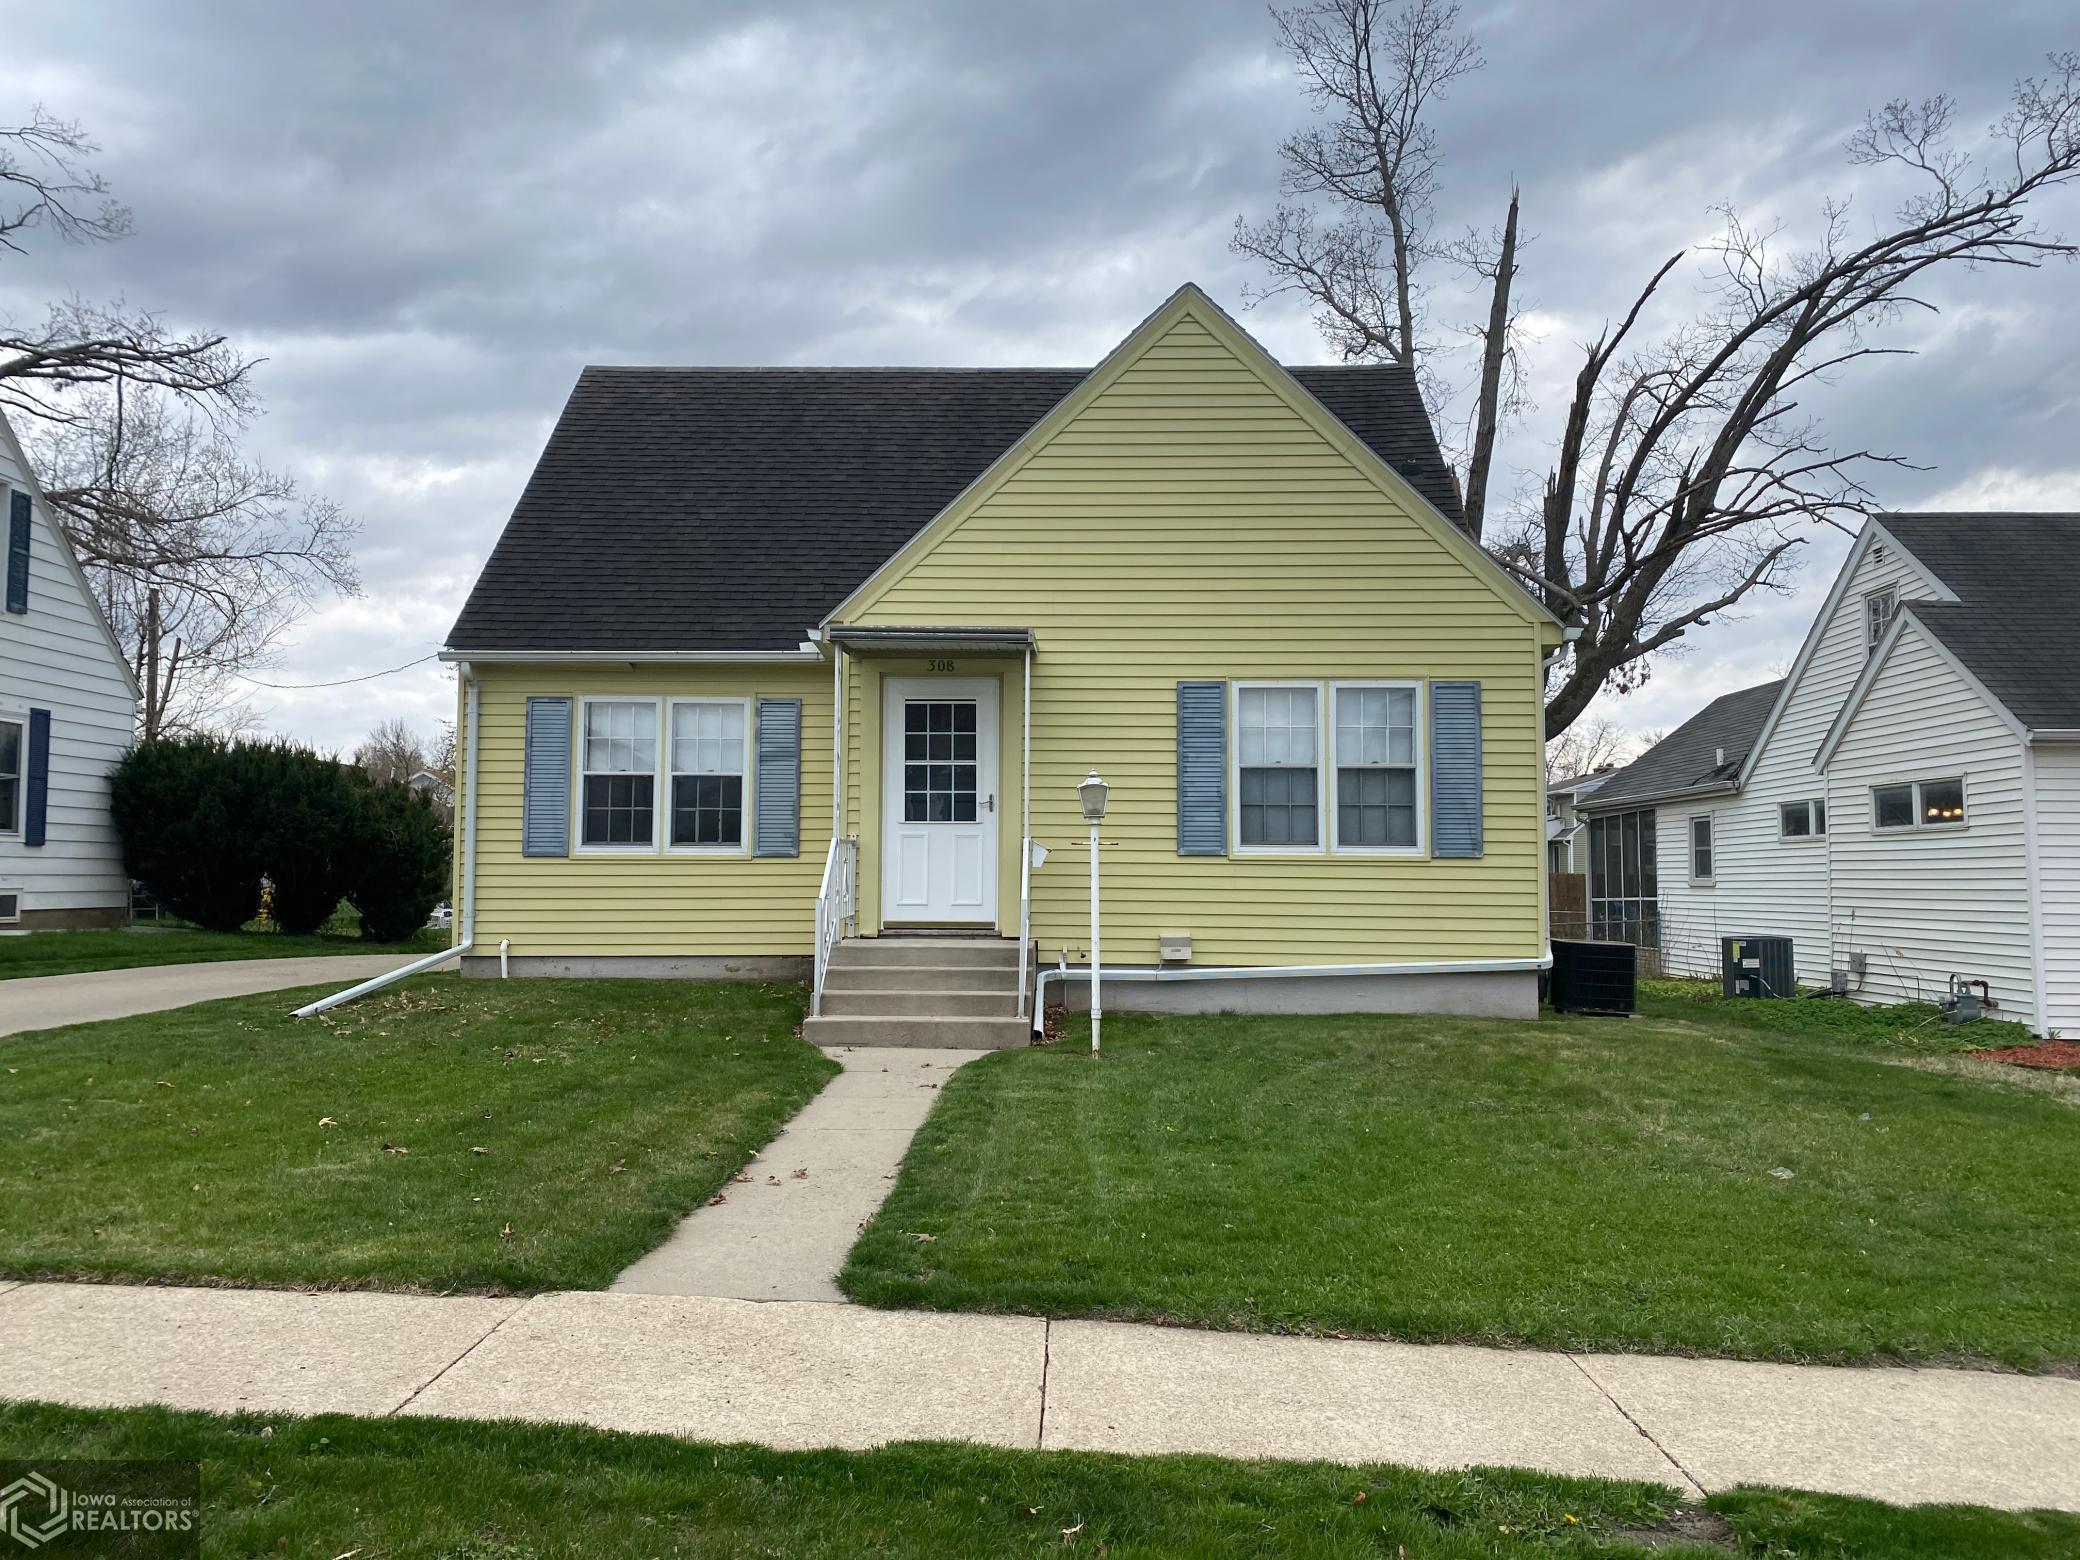 308 Innes, Marshalltown, Iowa 50158-5530, 2 Bedrooms Bedrooms, ,1 BathroomBathrooms,Single Family,For Sale,Innes,5742014